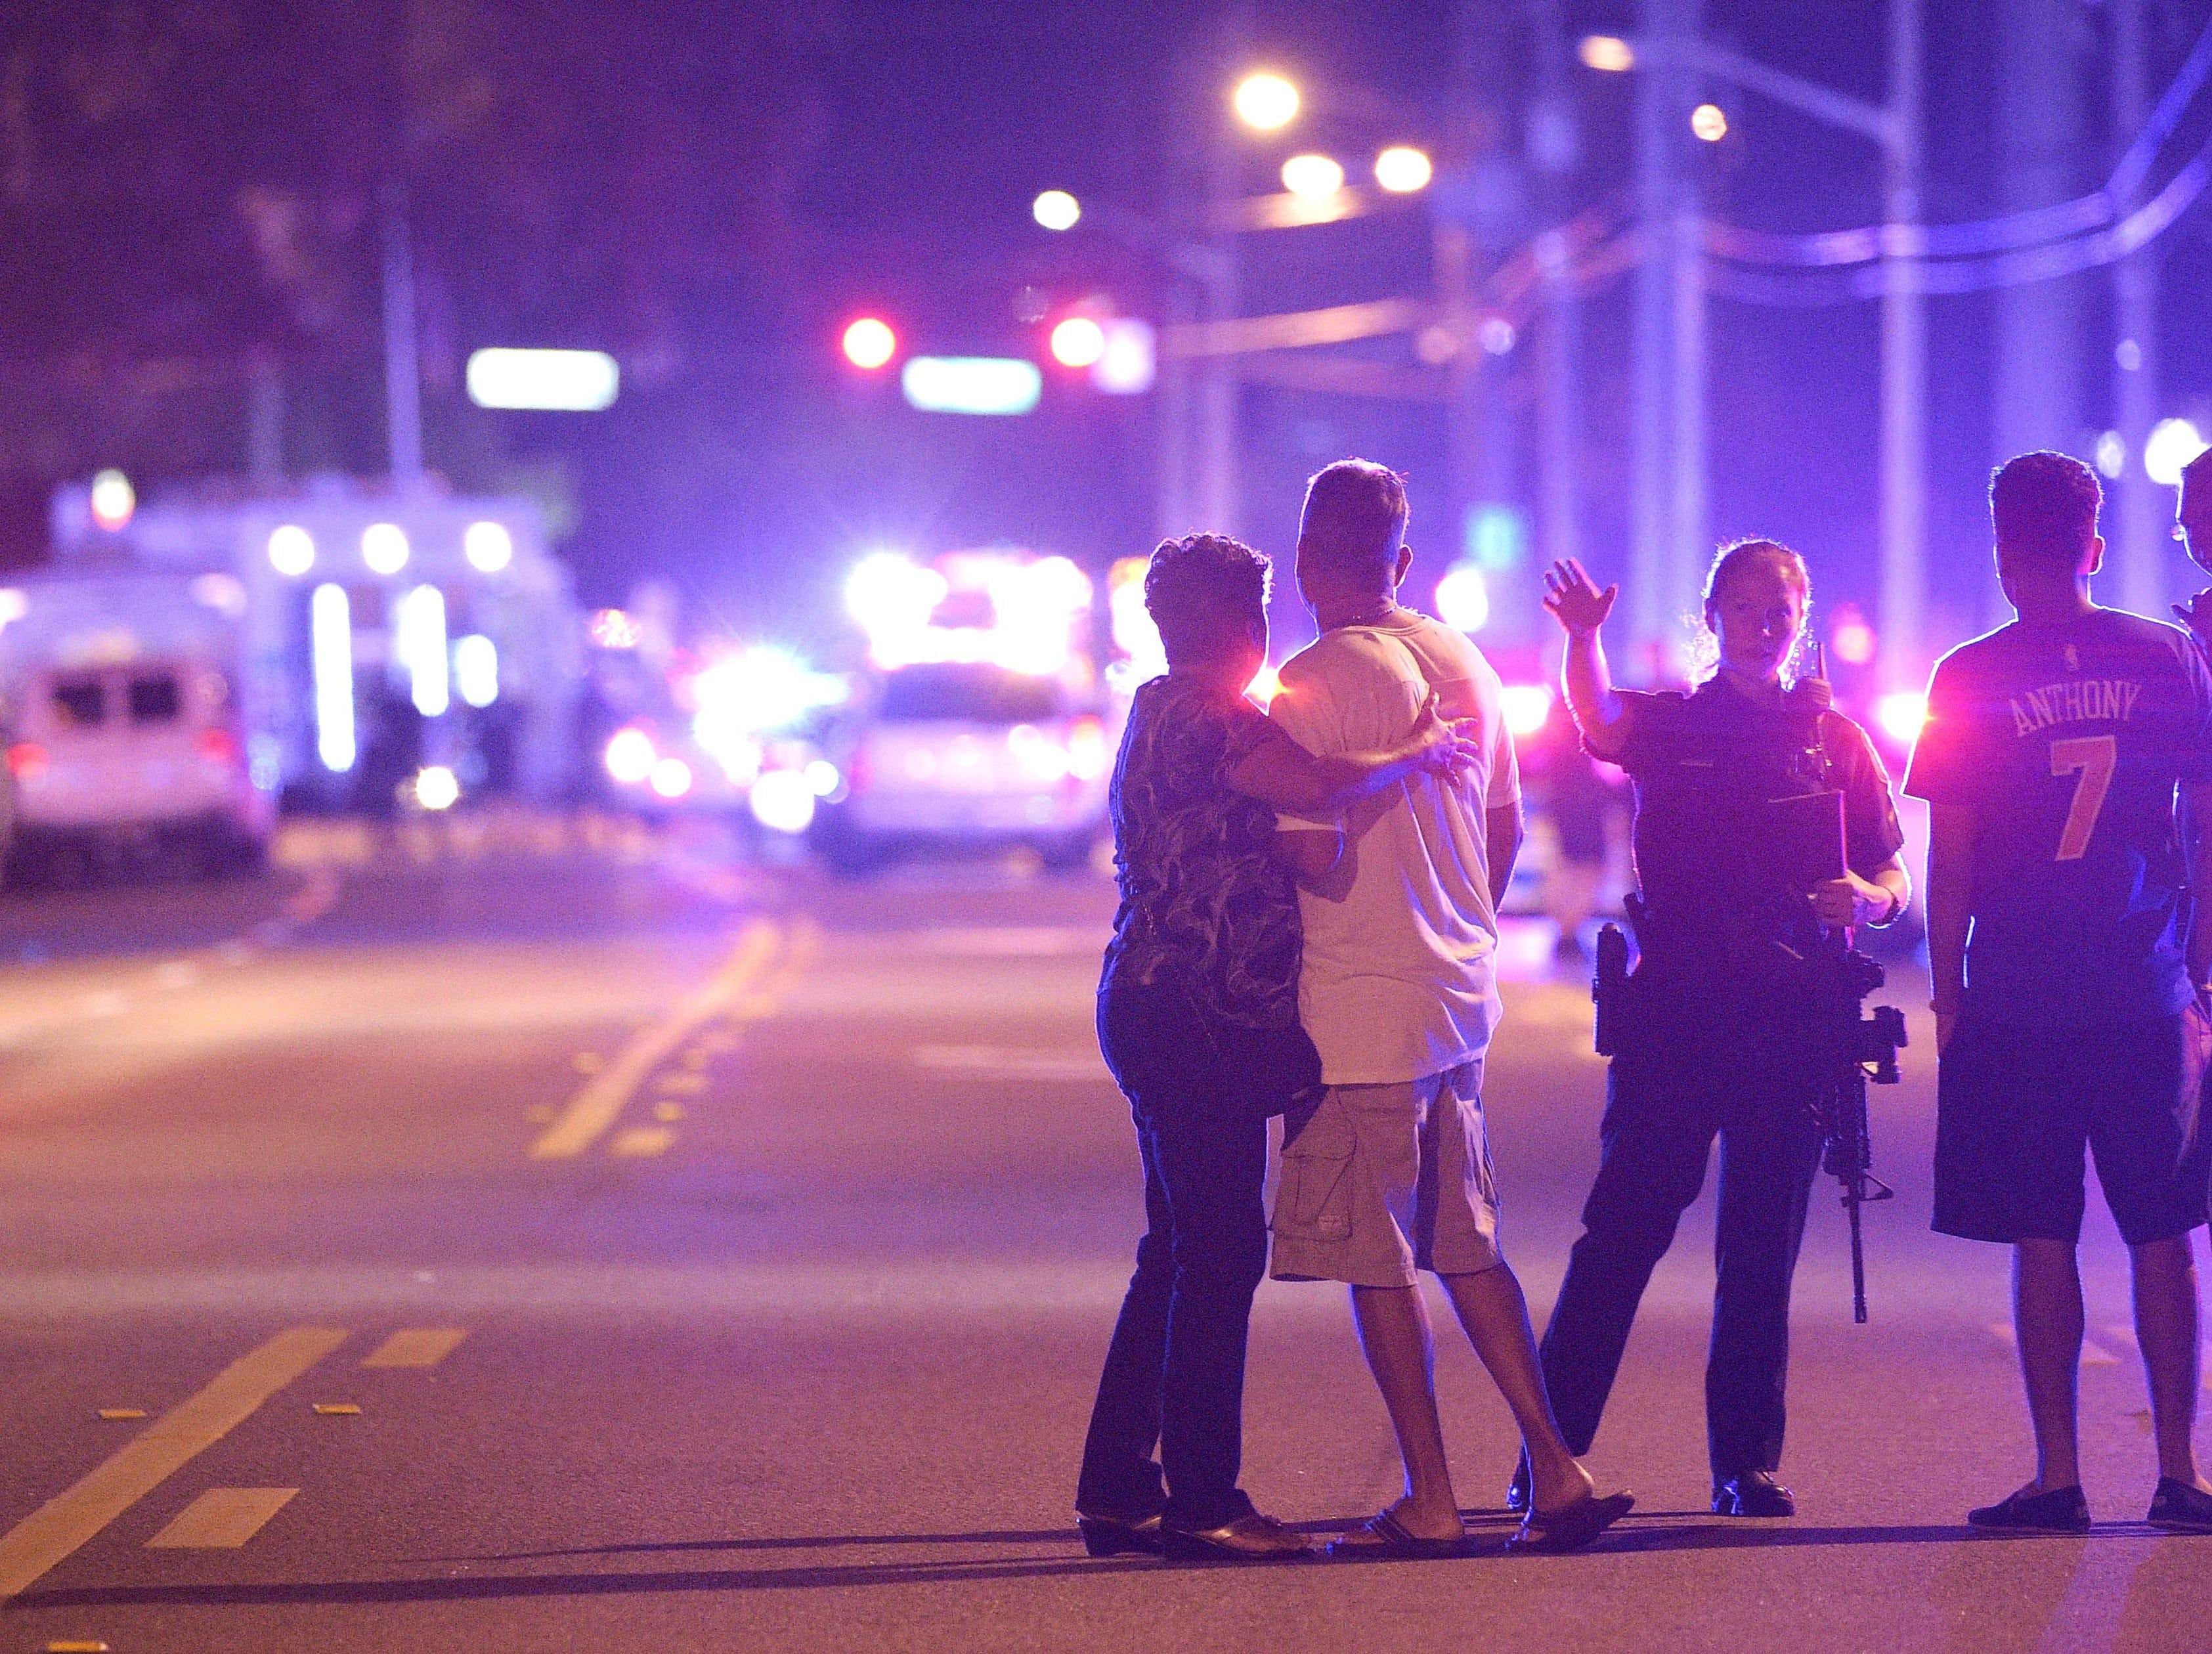 Pulse Nightclub   Orlando, Florida   June 12, 2016   50 dead   53 wounded